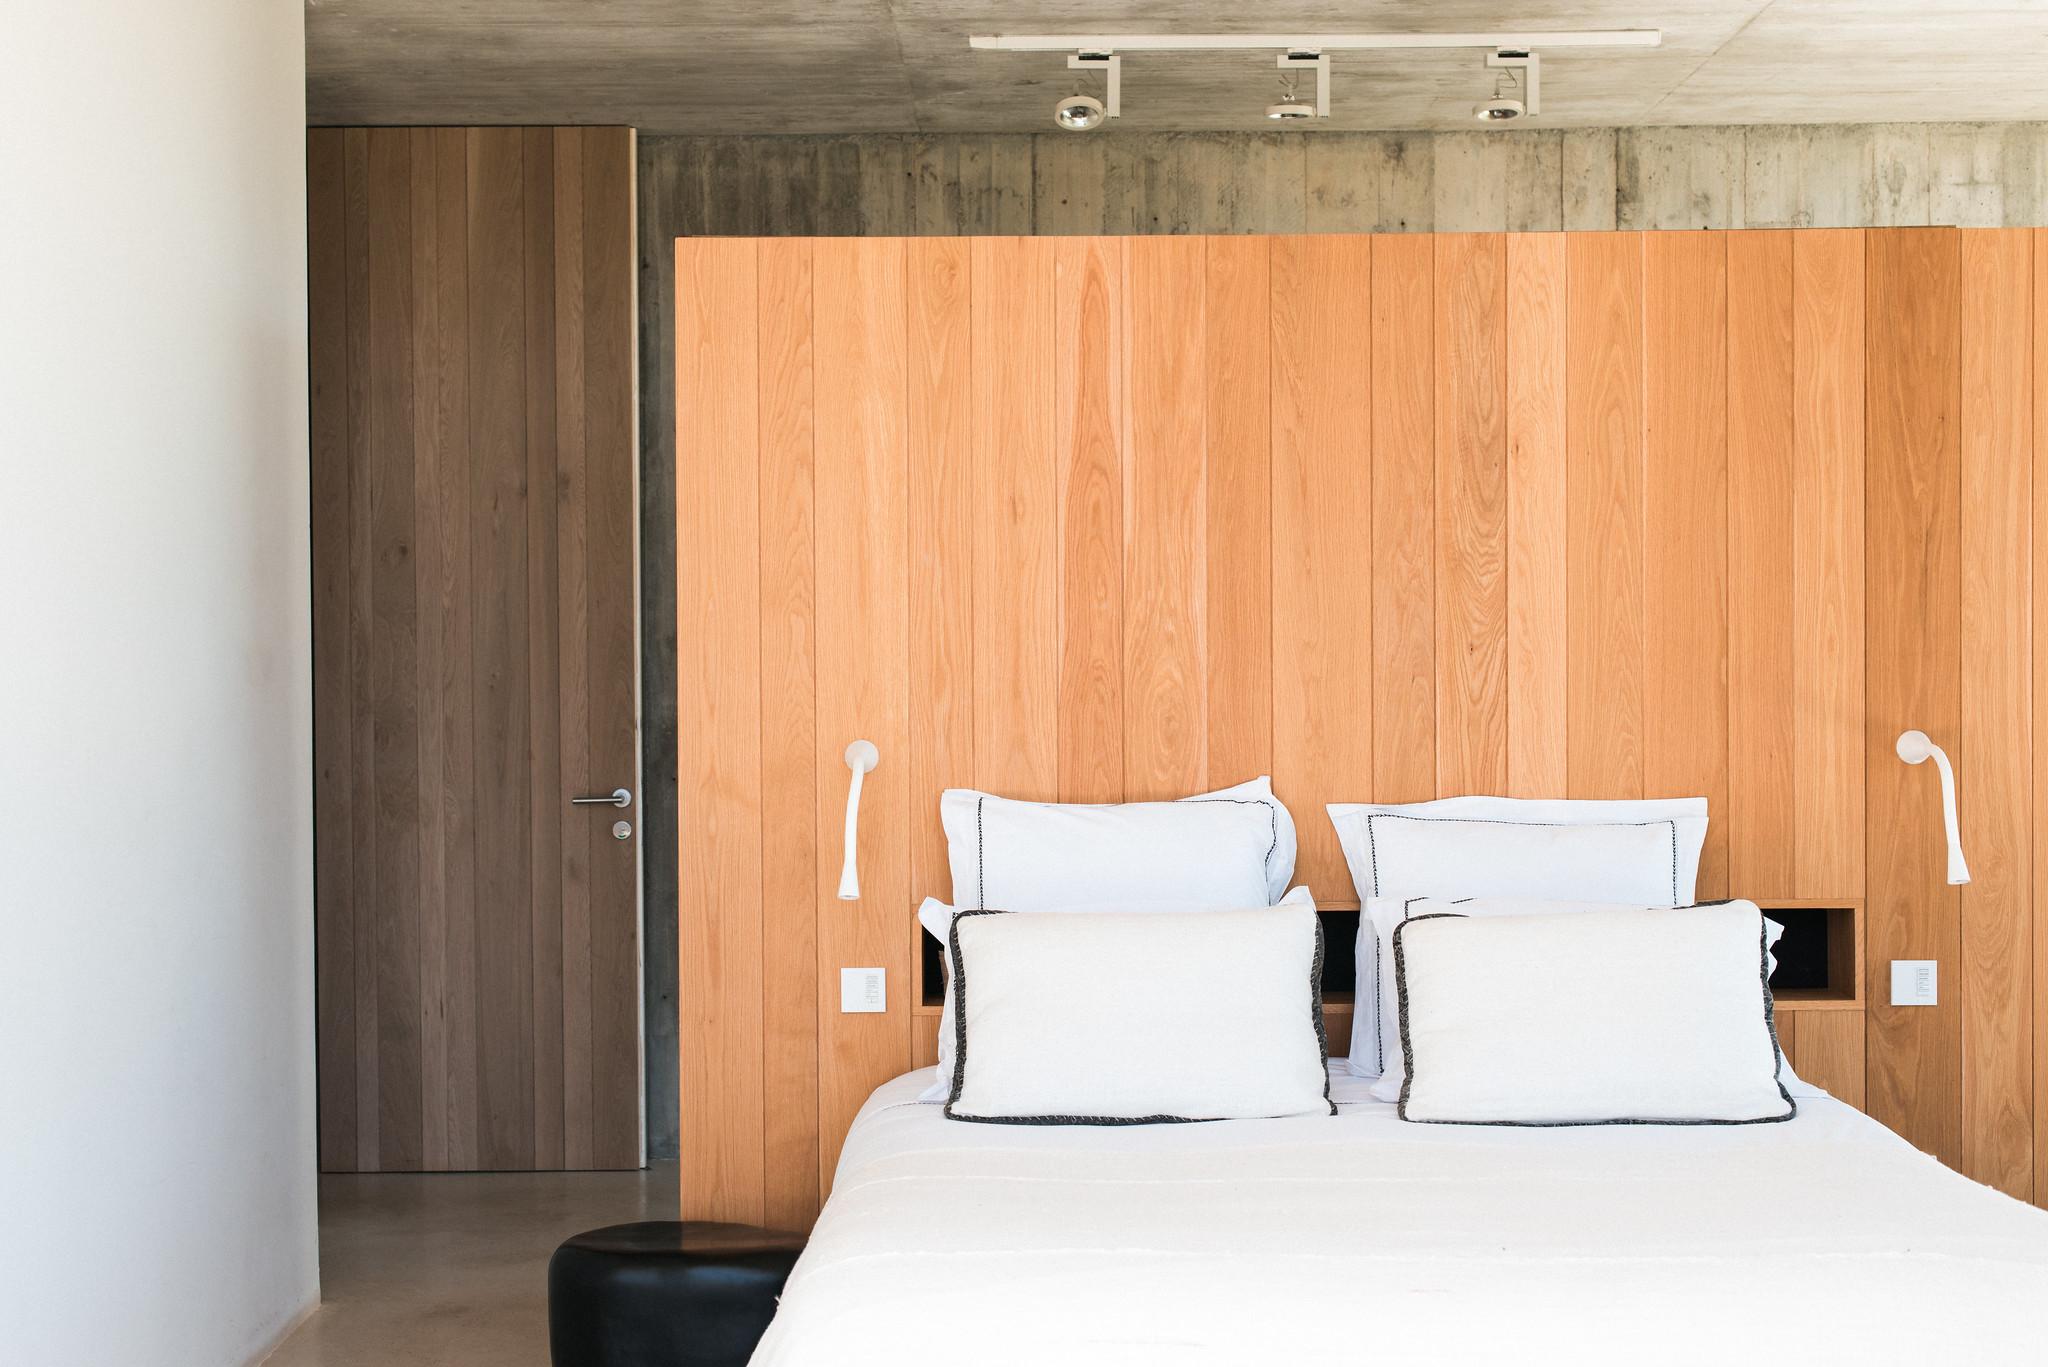 https://www.white-ibiza.com/wp-content/uploads/2020/06/white-ibiza-villas-casa-valentina-interior-bedroom.jpg